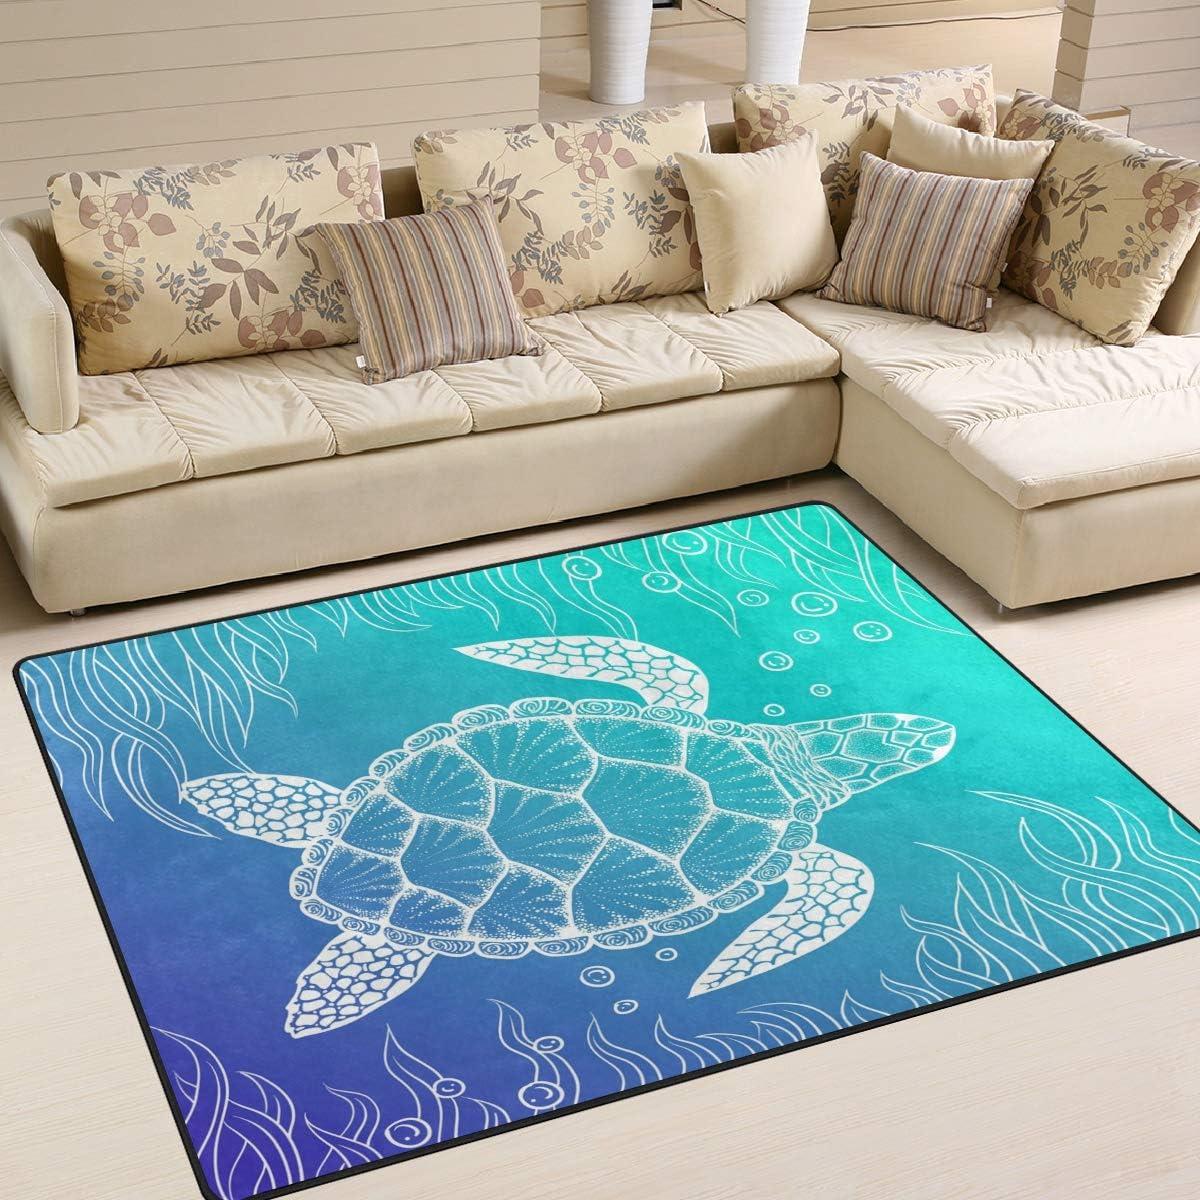 ALAZA Art Stylish Sea Turtle Area Rug Rugs for Living Room Bedroom 7 x 5